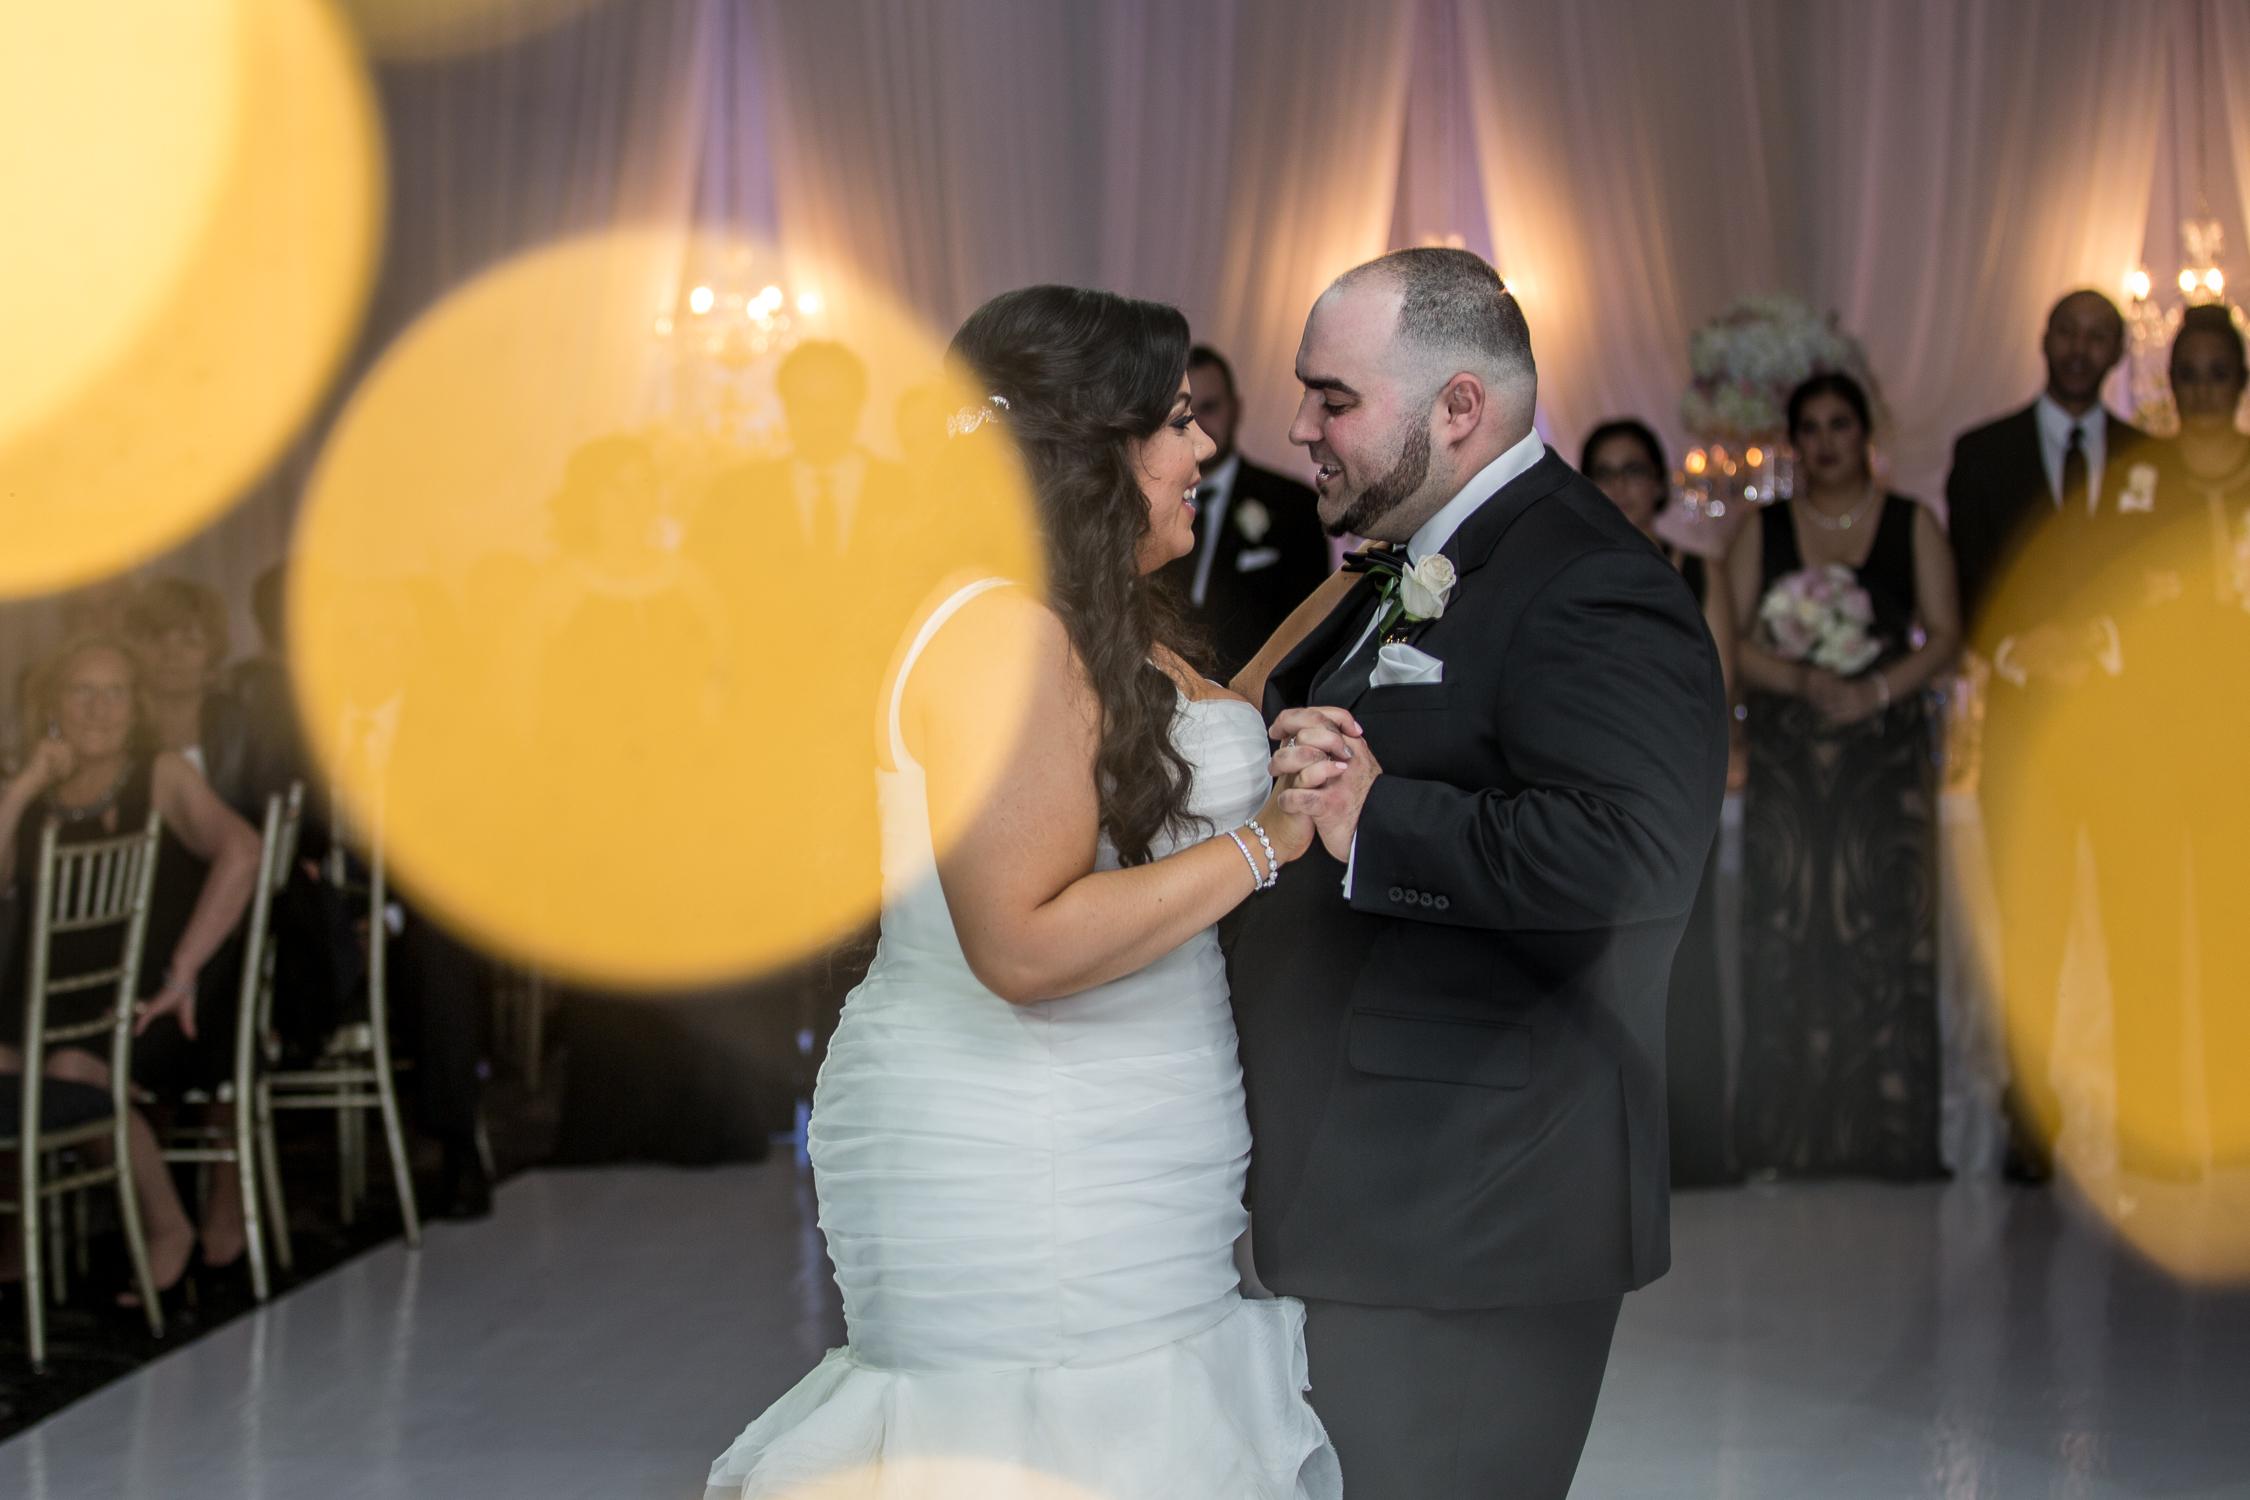 Peter-and-Marie-Wedding-Fontana-Primavera-Graydon-Hall-Manor-Toronto-Ontario-Canada-0046.jpg